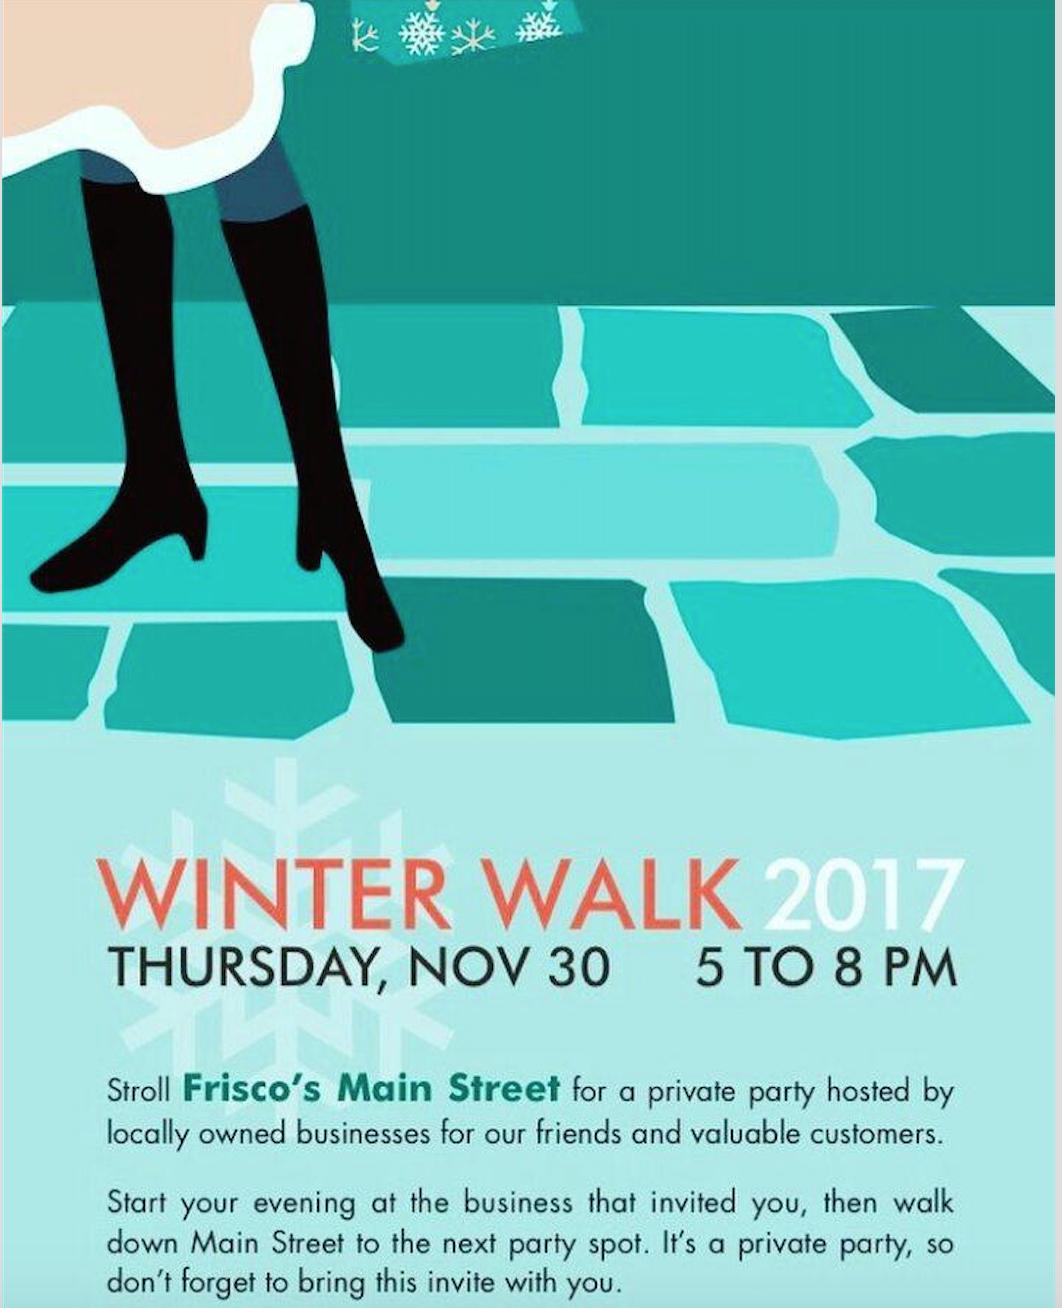 Winter Walk 2017.png